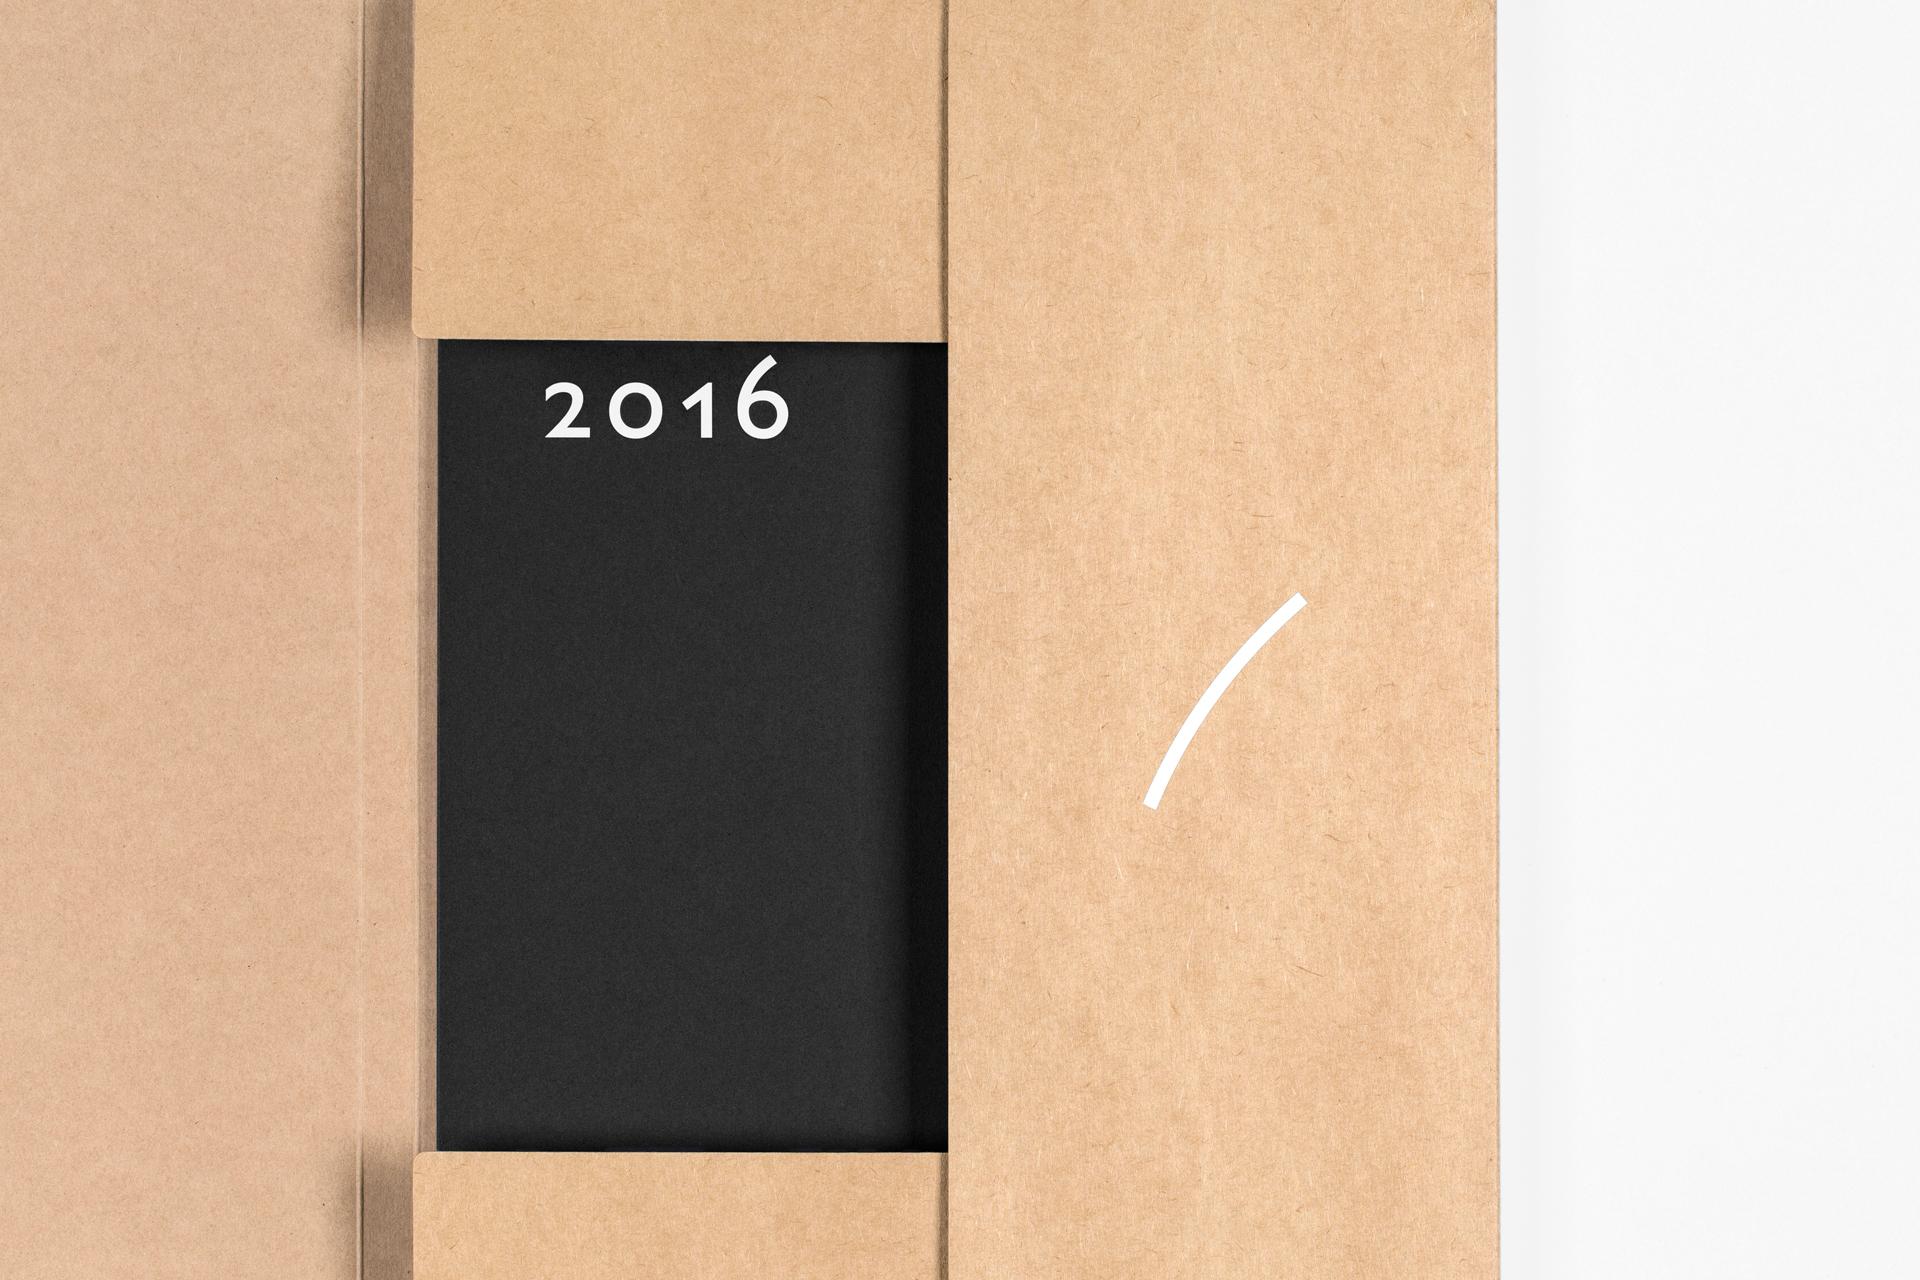 backside-calendar-2016_03